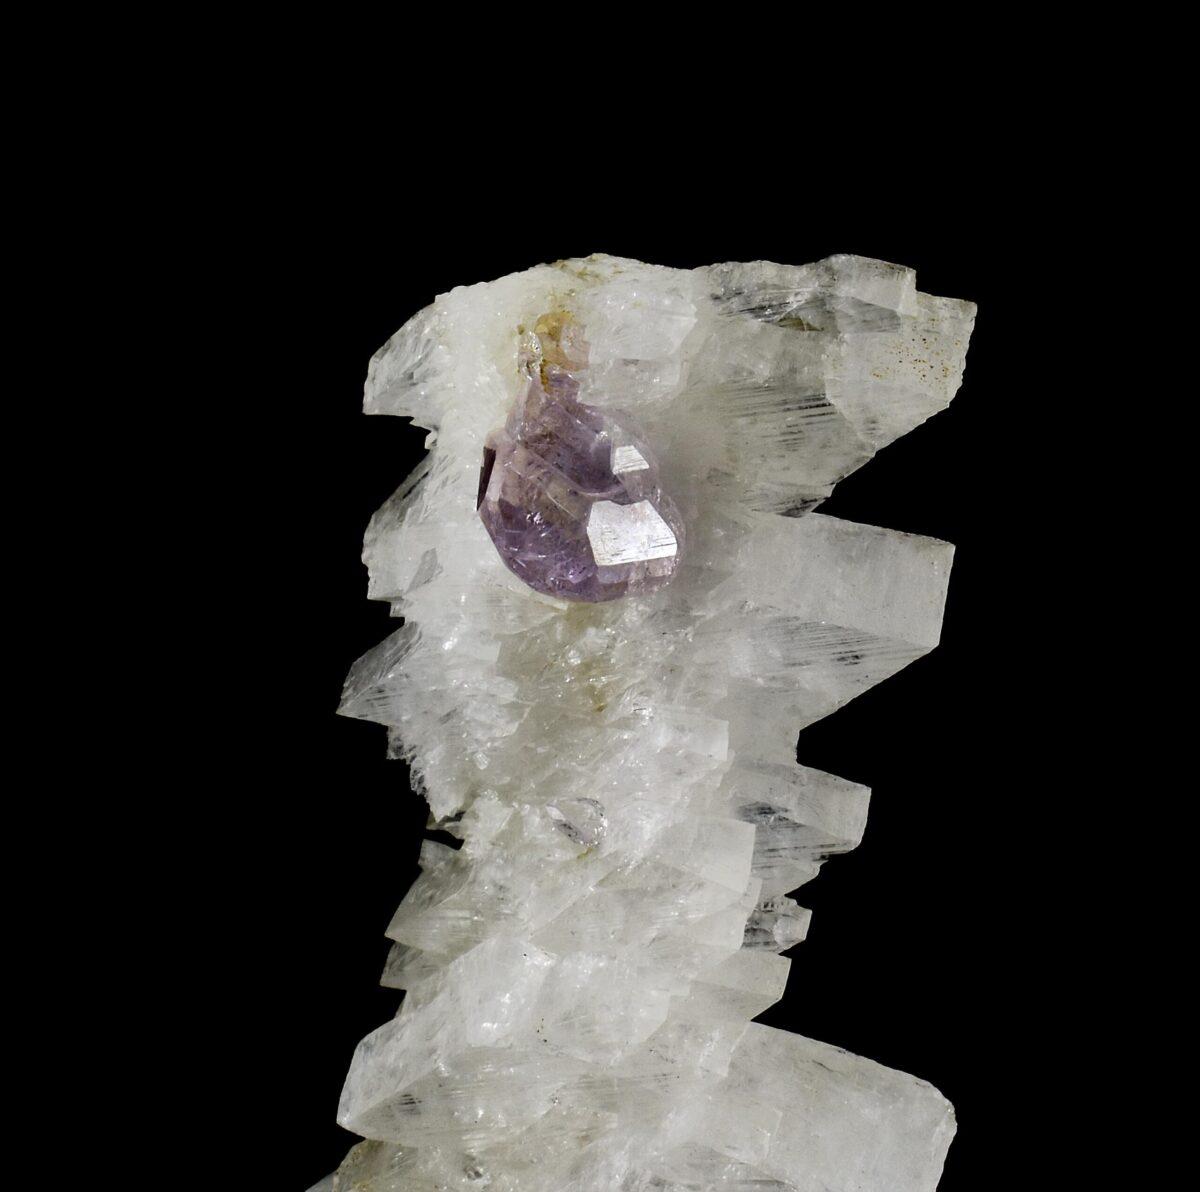 Apatite & adularia from the Val Giuv, Switzerland